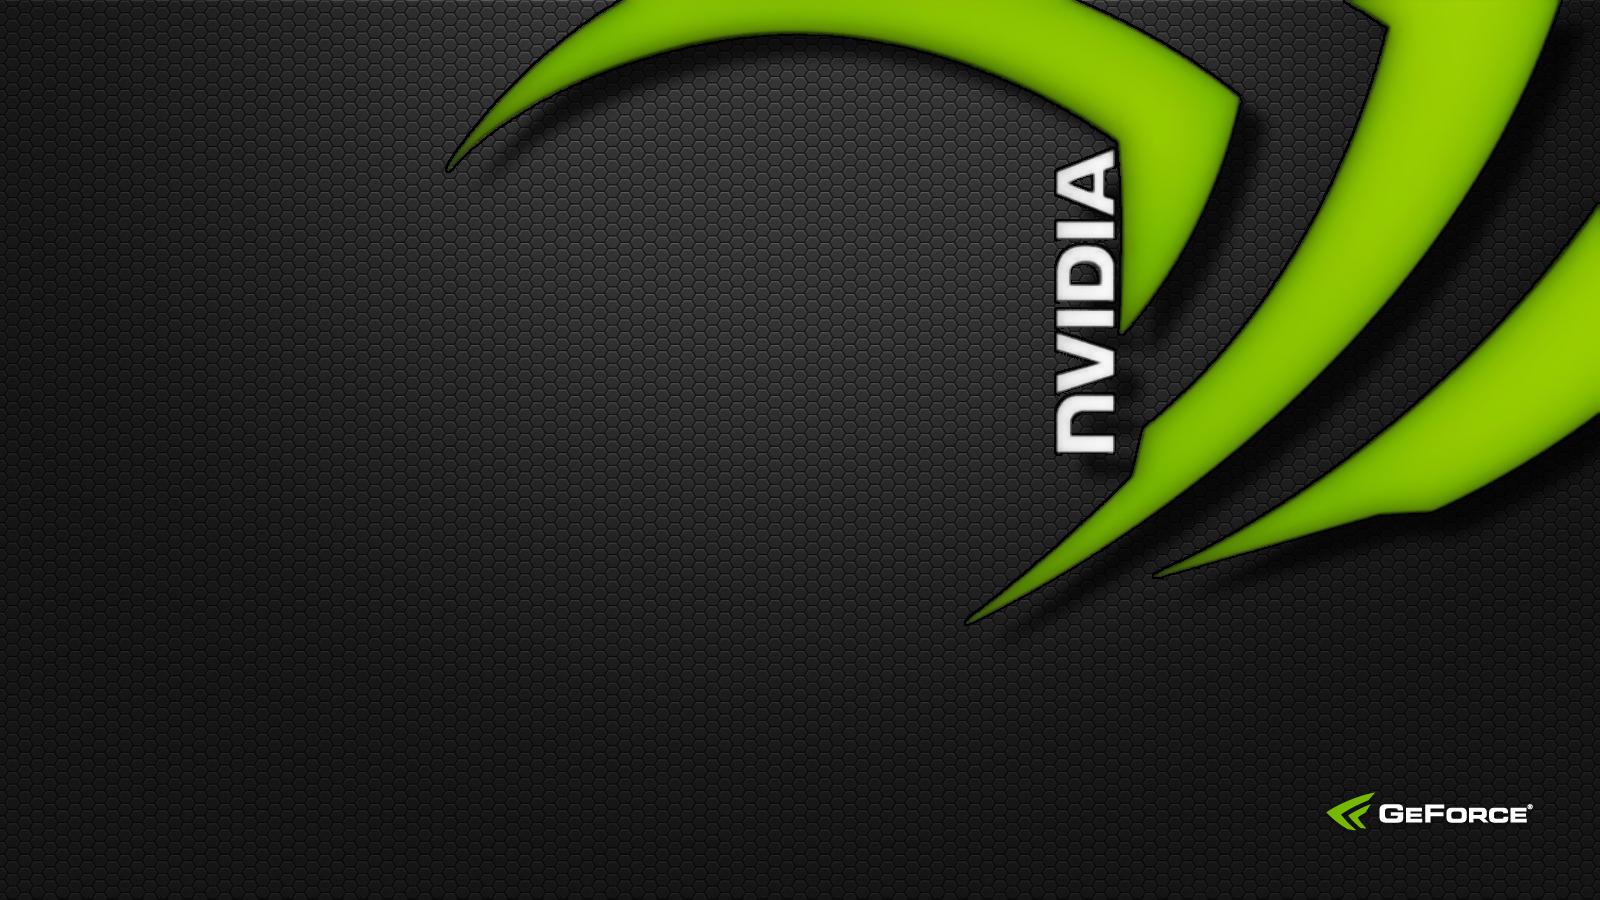 nvidia wallpaper 1600x900 - photo #2